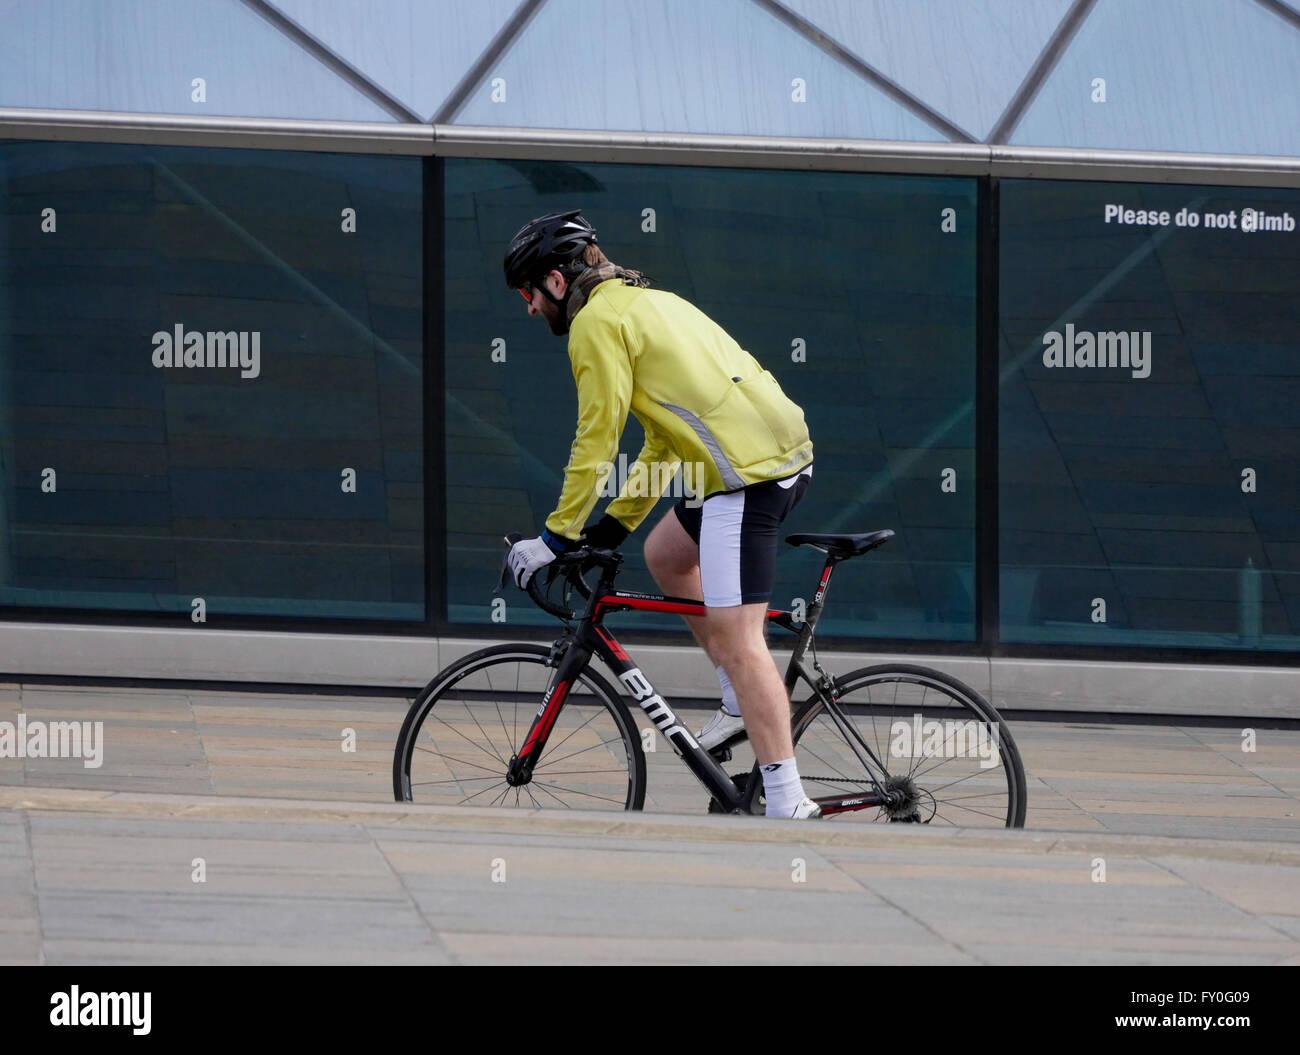 A cyclist enjoying a ride - Stock Image